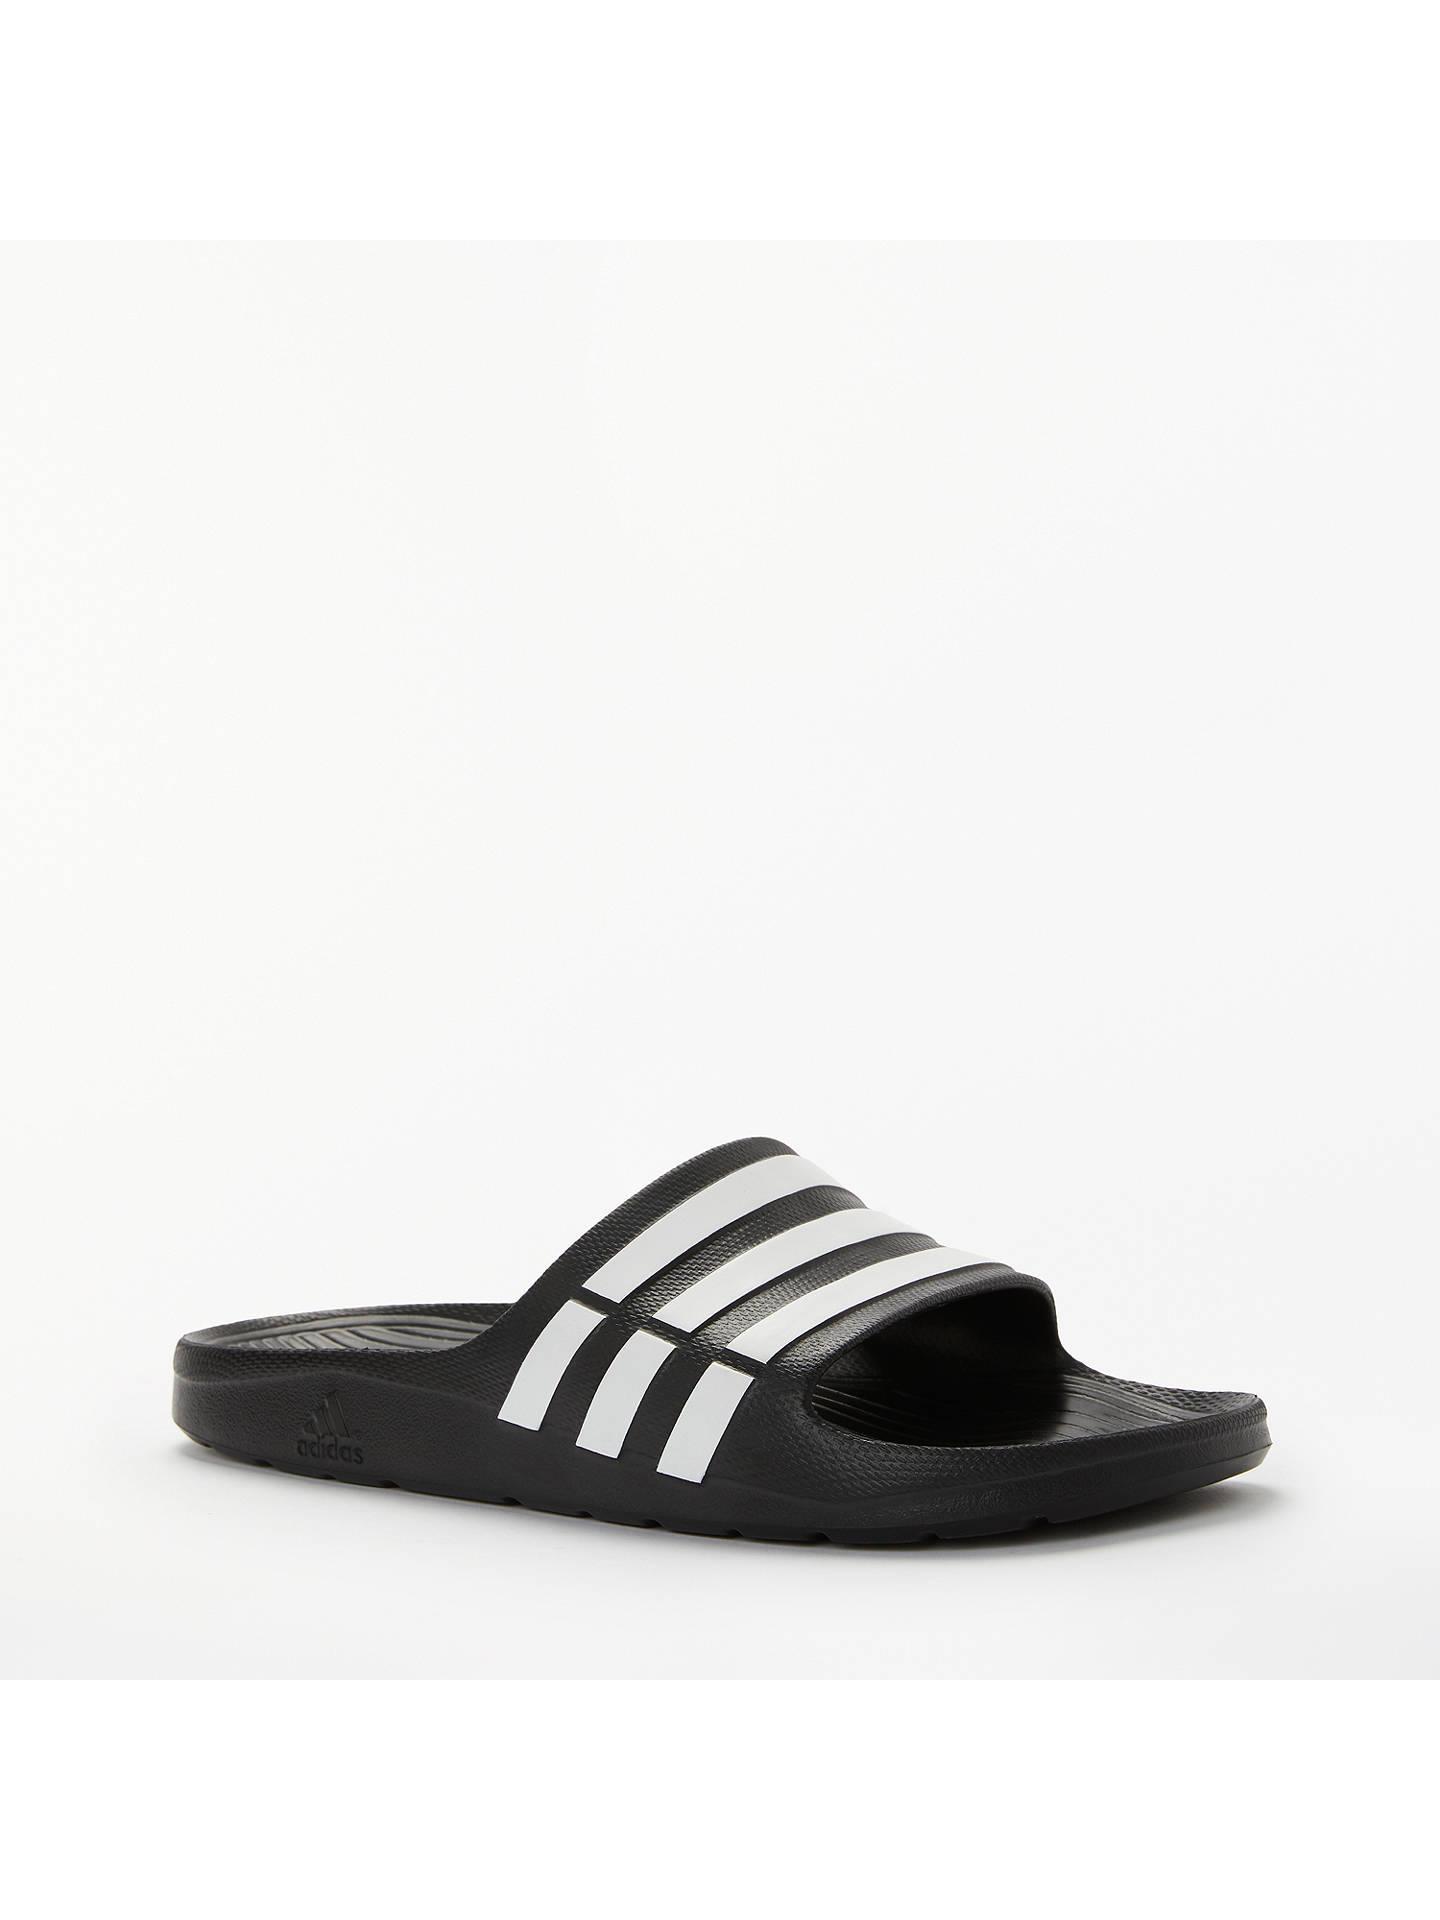 6a92aa0fd adidas Duramo Slides Slippers at John Lewis   Partners